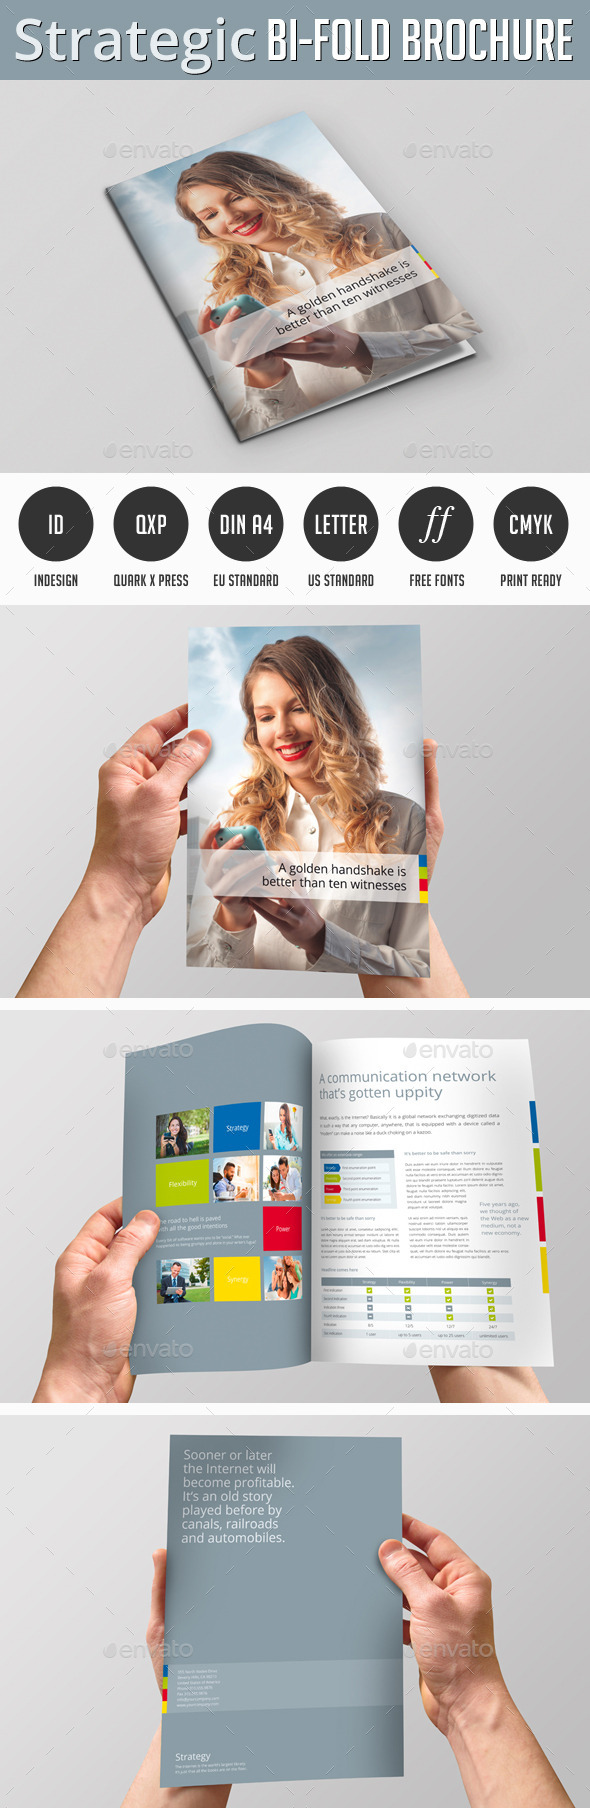 Strategic Bi-Fold Brochure - Corporate Brochures